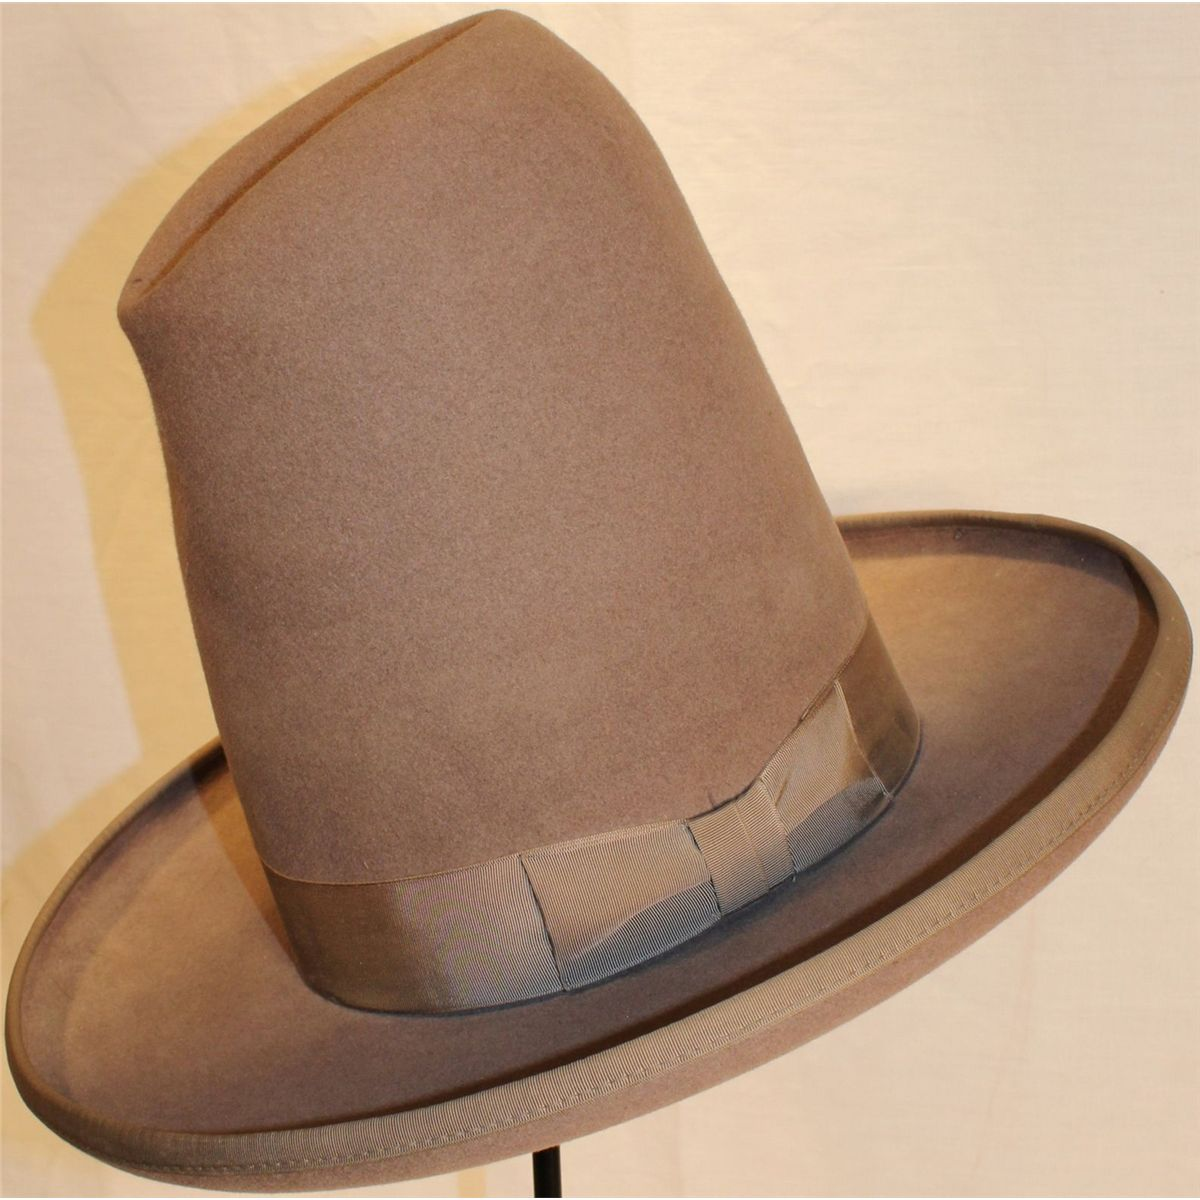 600887df987c7 Image 1   Old Cowboy Hat